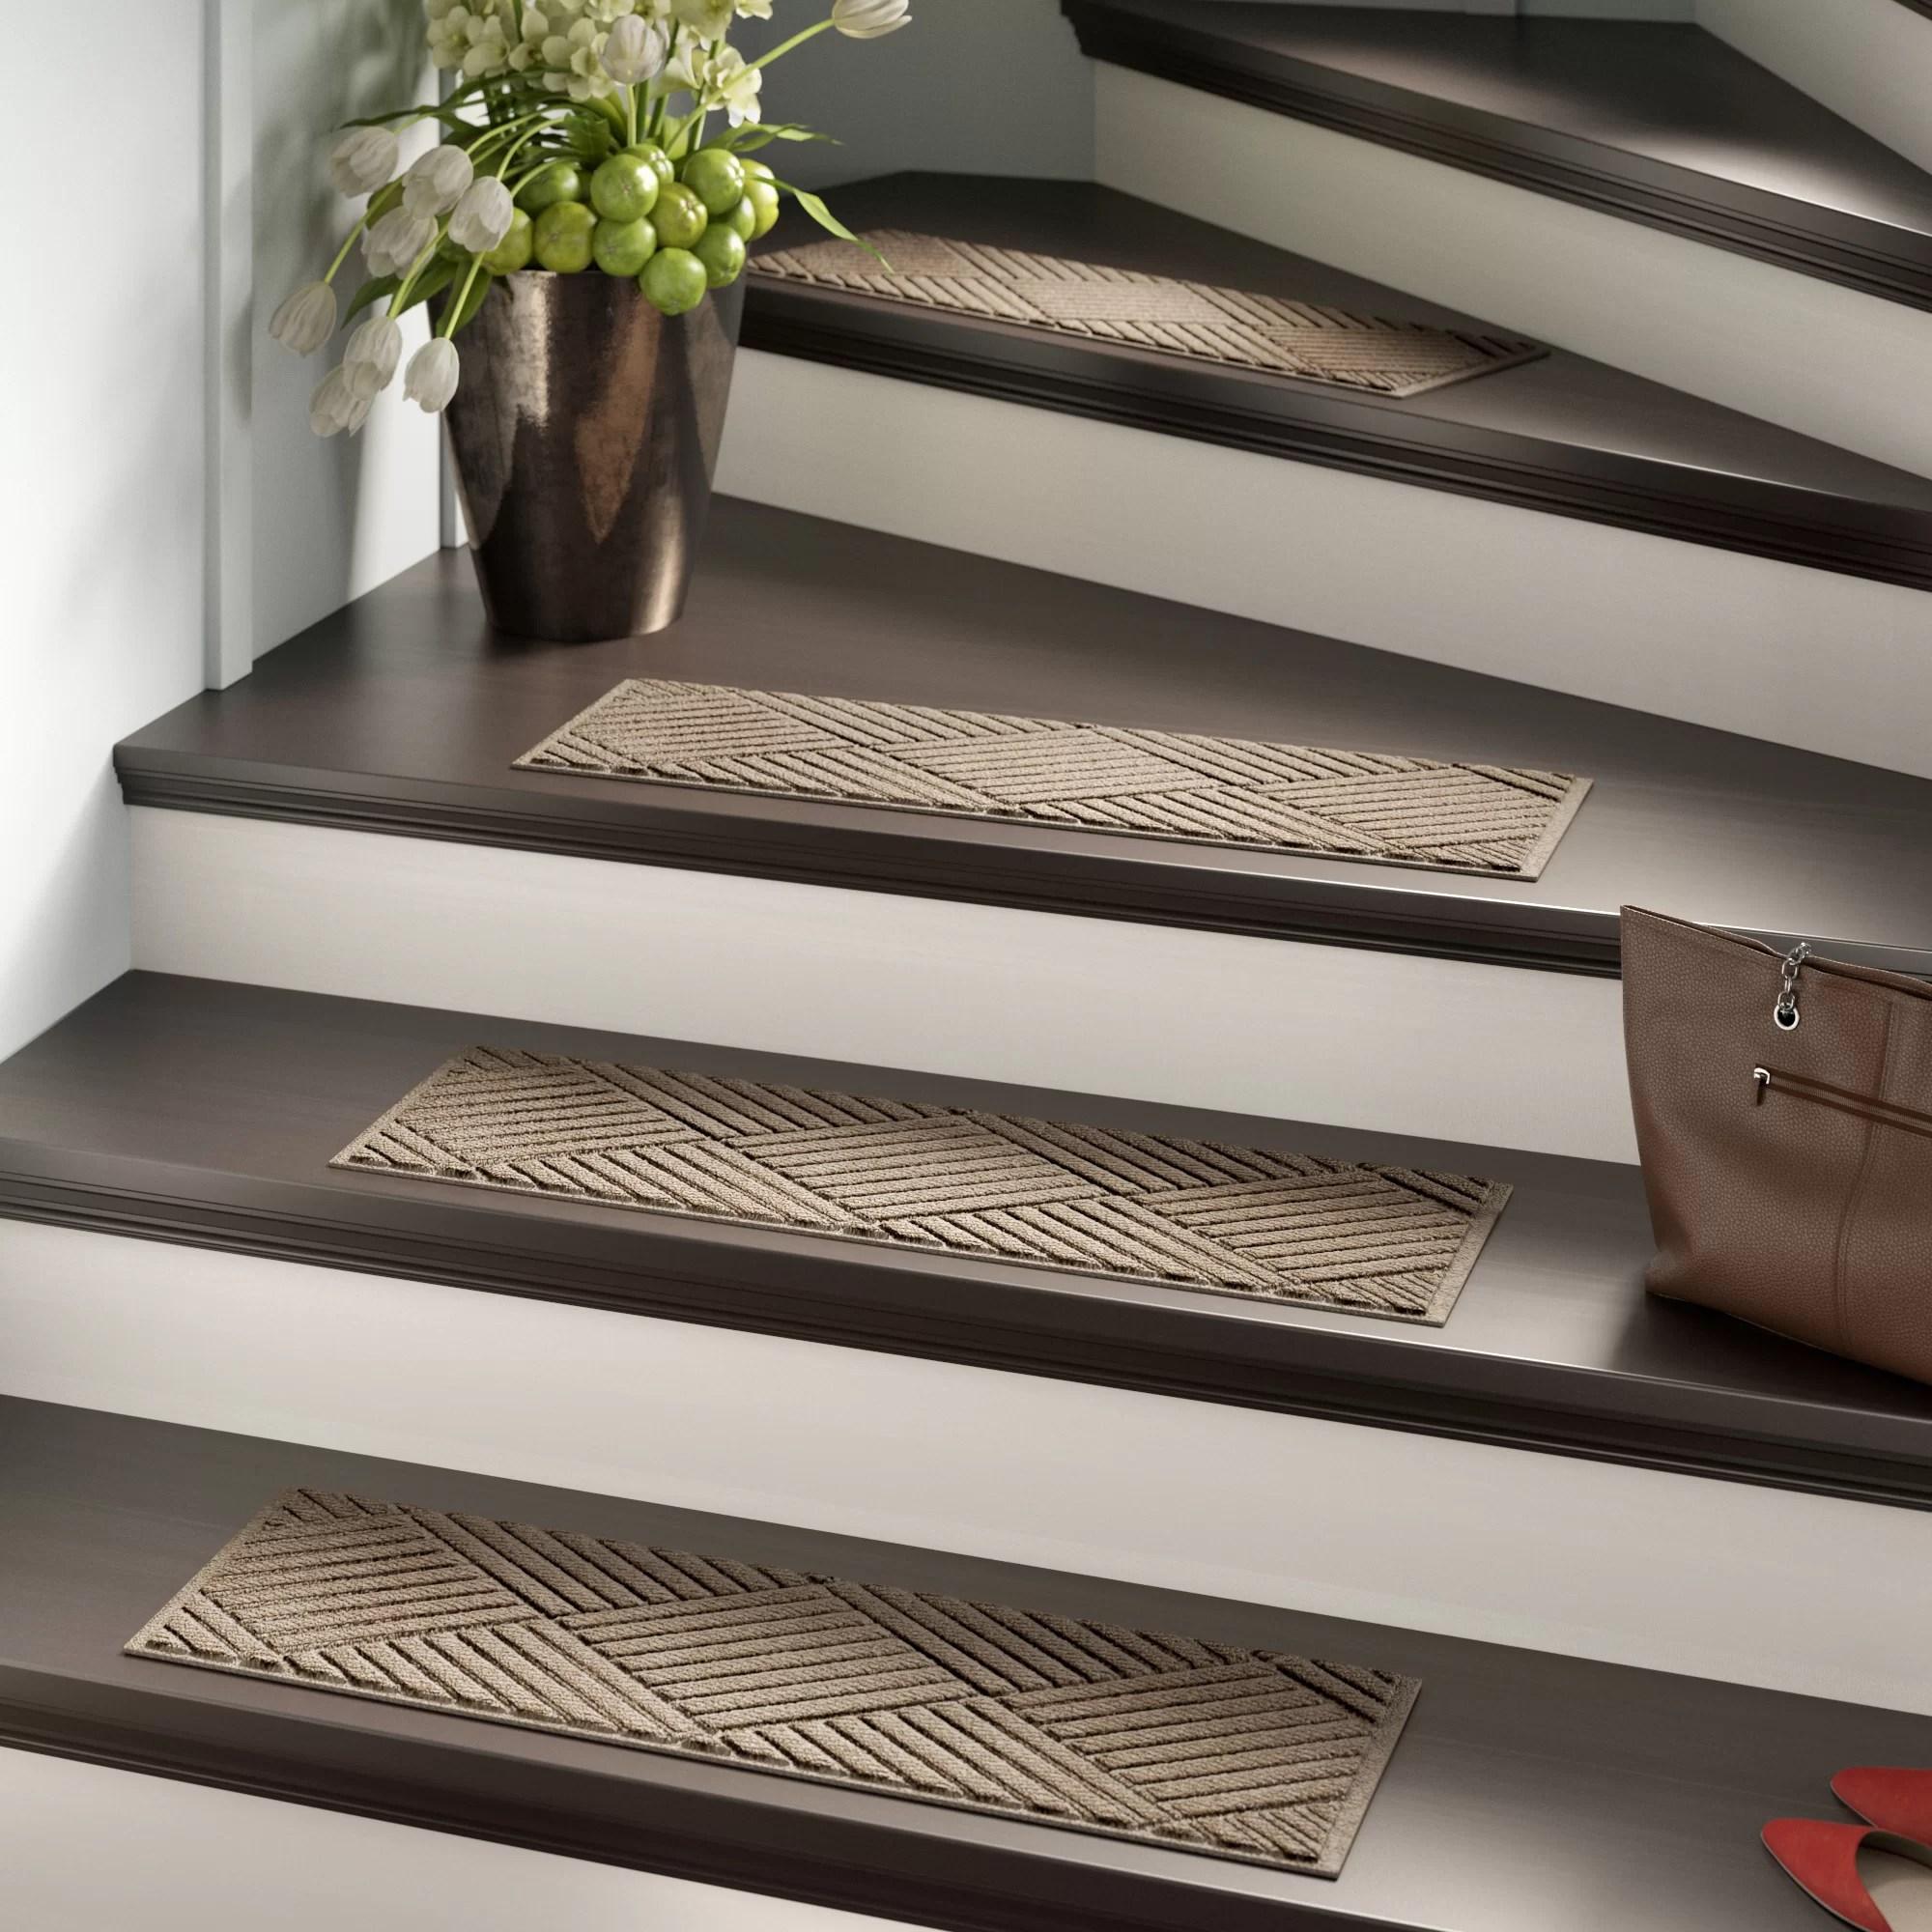 Stair Tread Rugs You Ll Love In 2020 Wayfair   Stair Step Carpet Runners   Hallway Carpet   Walmart   Flooring   Non Slip Stair   Wall Carpet